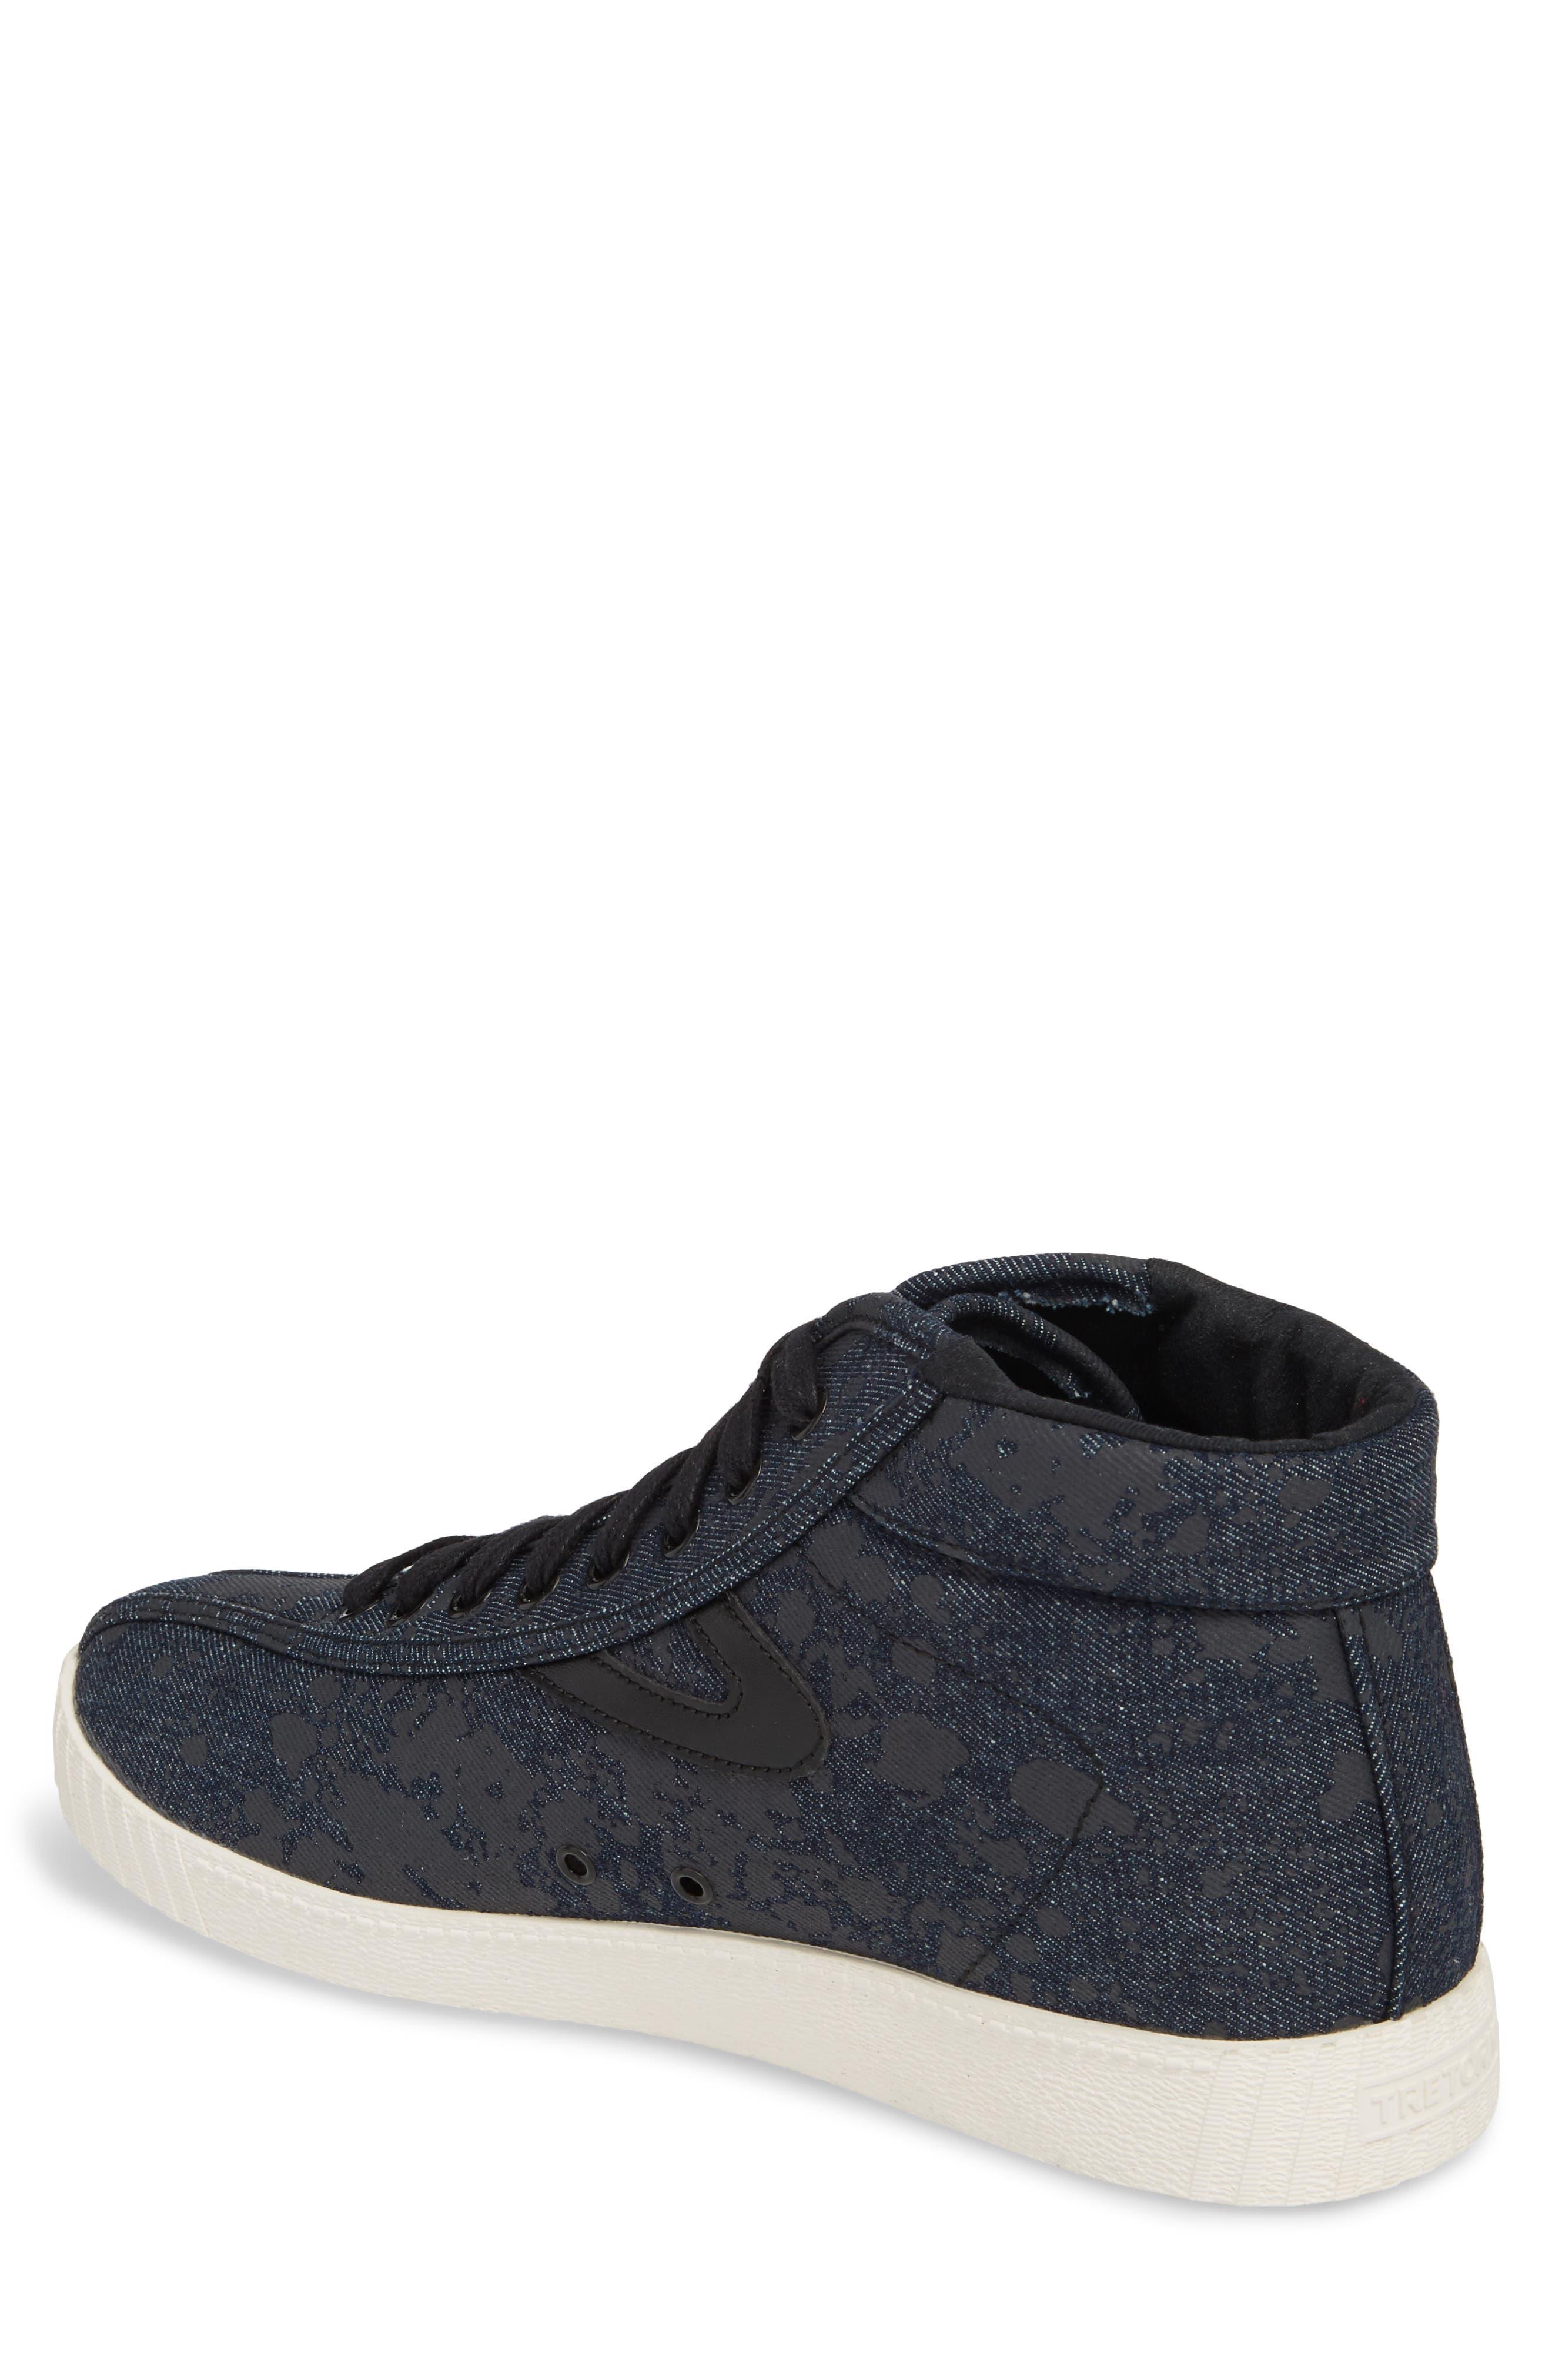 Nylite High Top Sneaker,                             Alternate thumbnail 2, color,                             Nero Opaco/ Black Denim